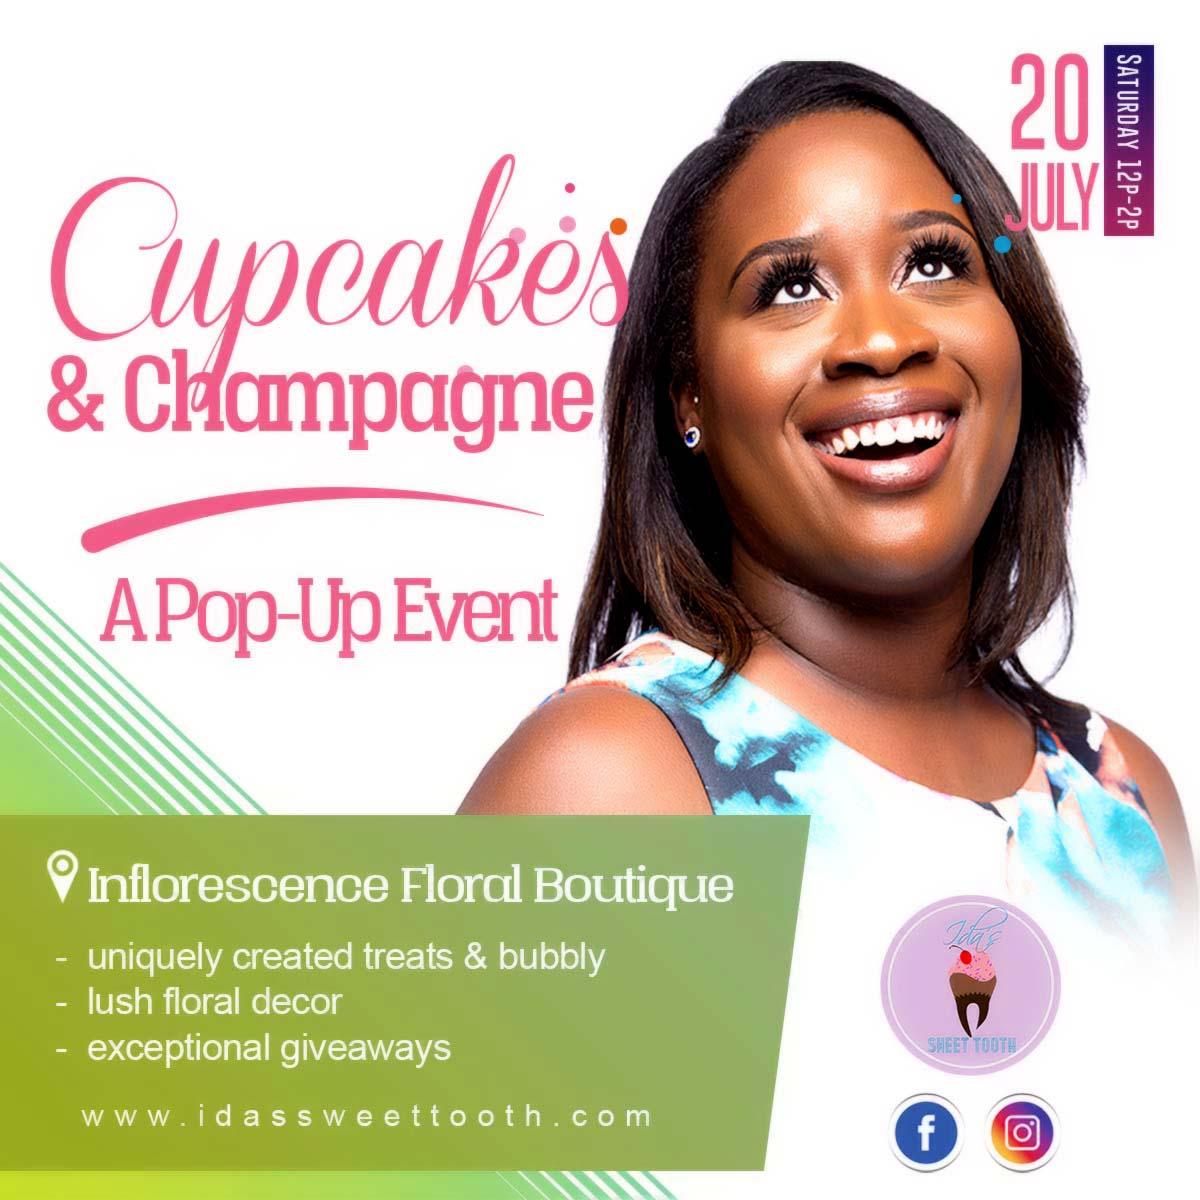 cupcakes&champagne.jpg